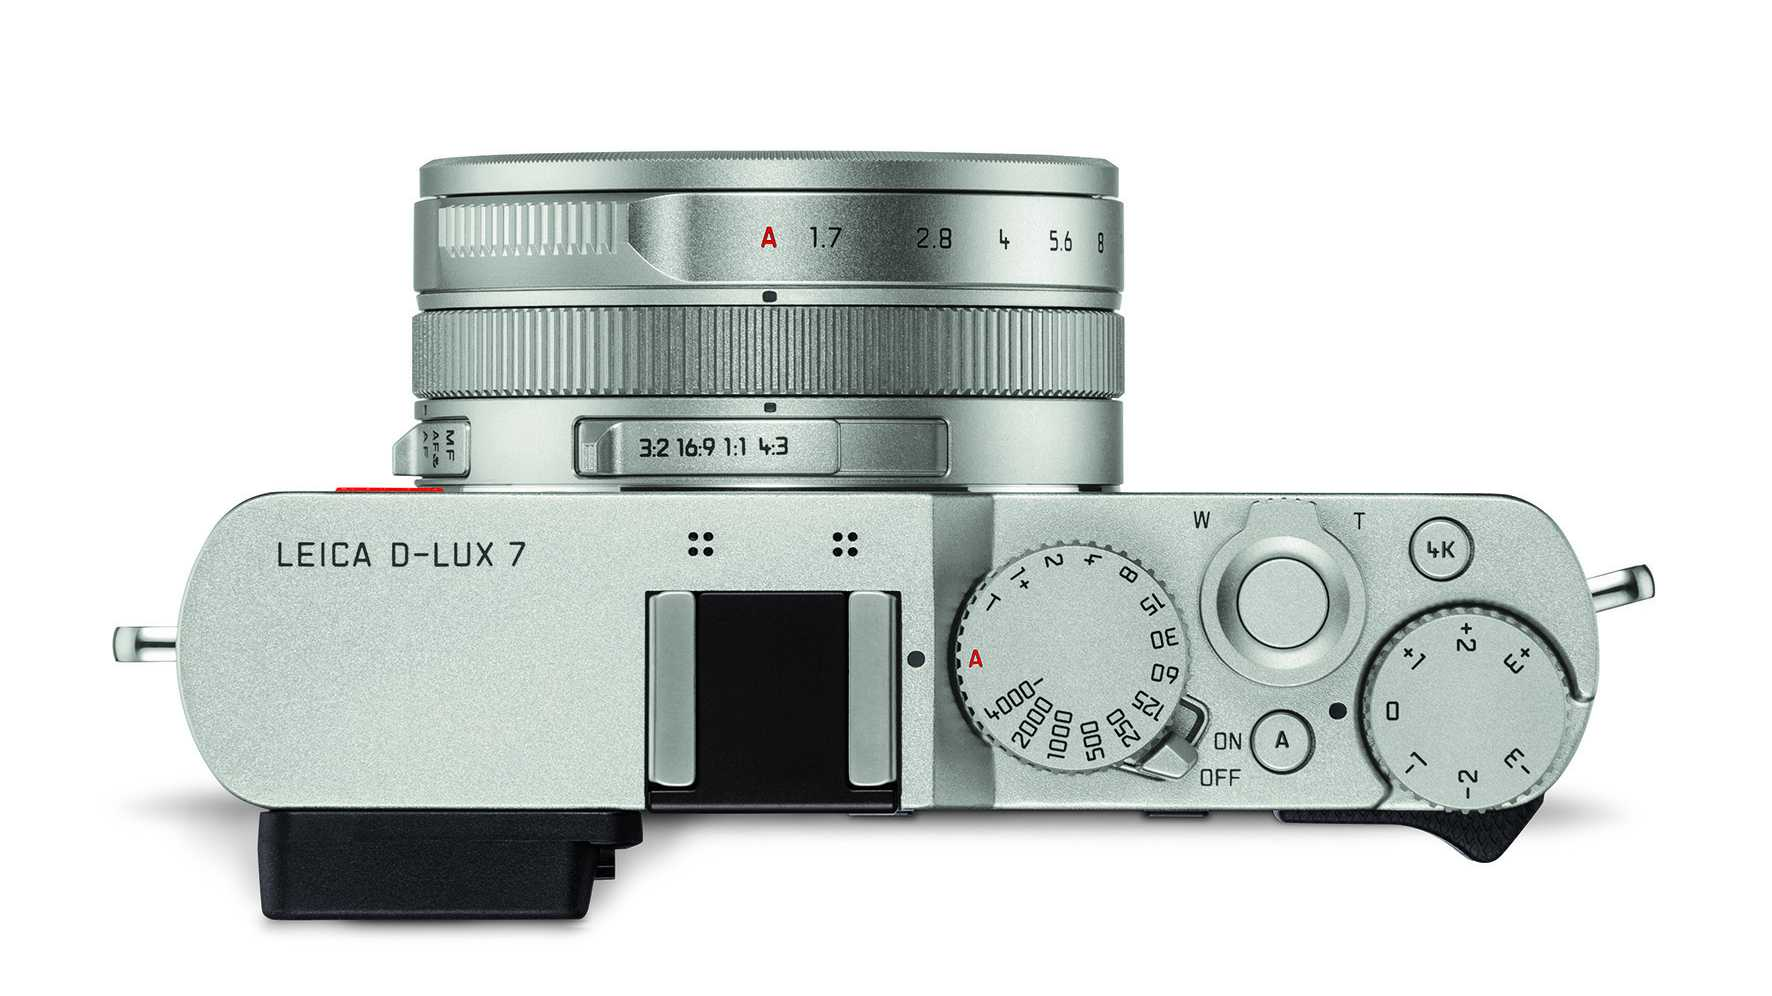 Leica D-Lux 7: Premium-Kompaktkamera mit großem Sensor